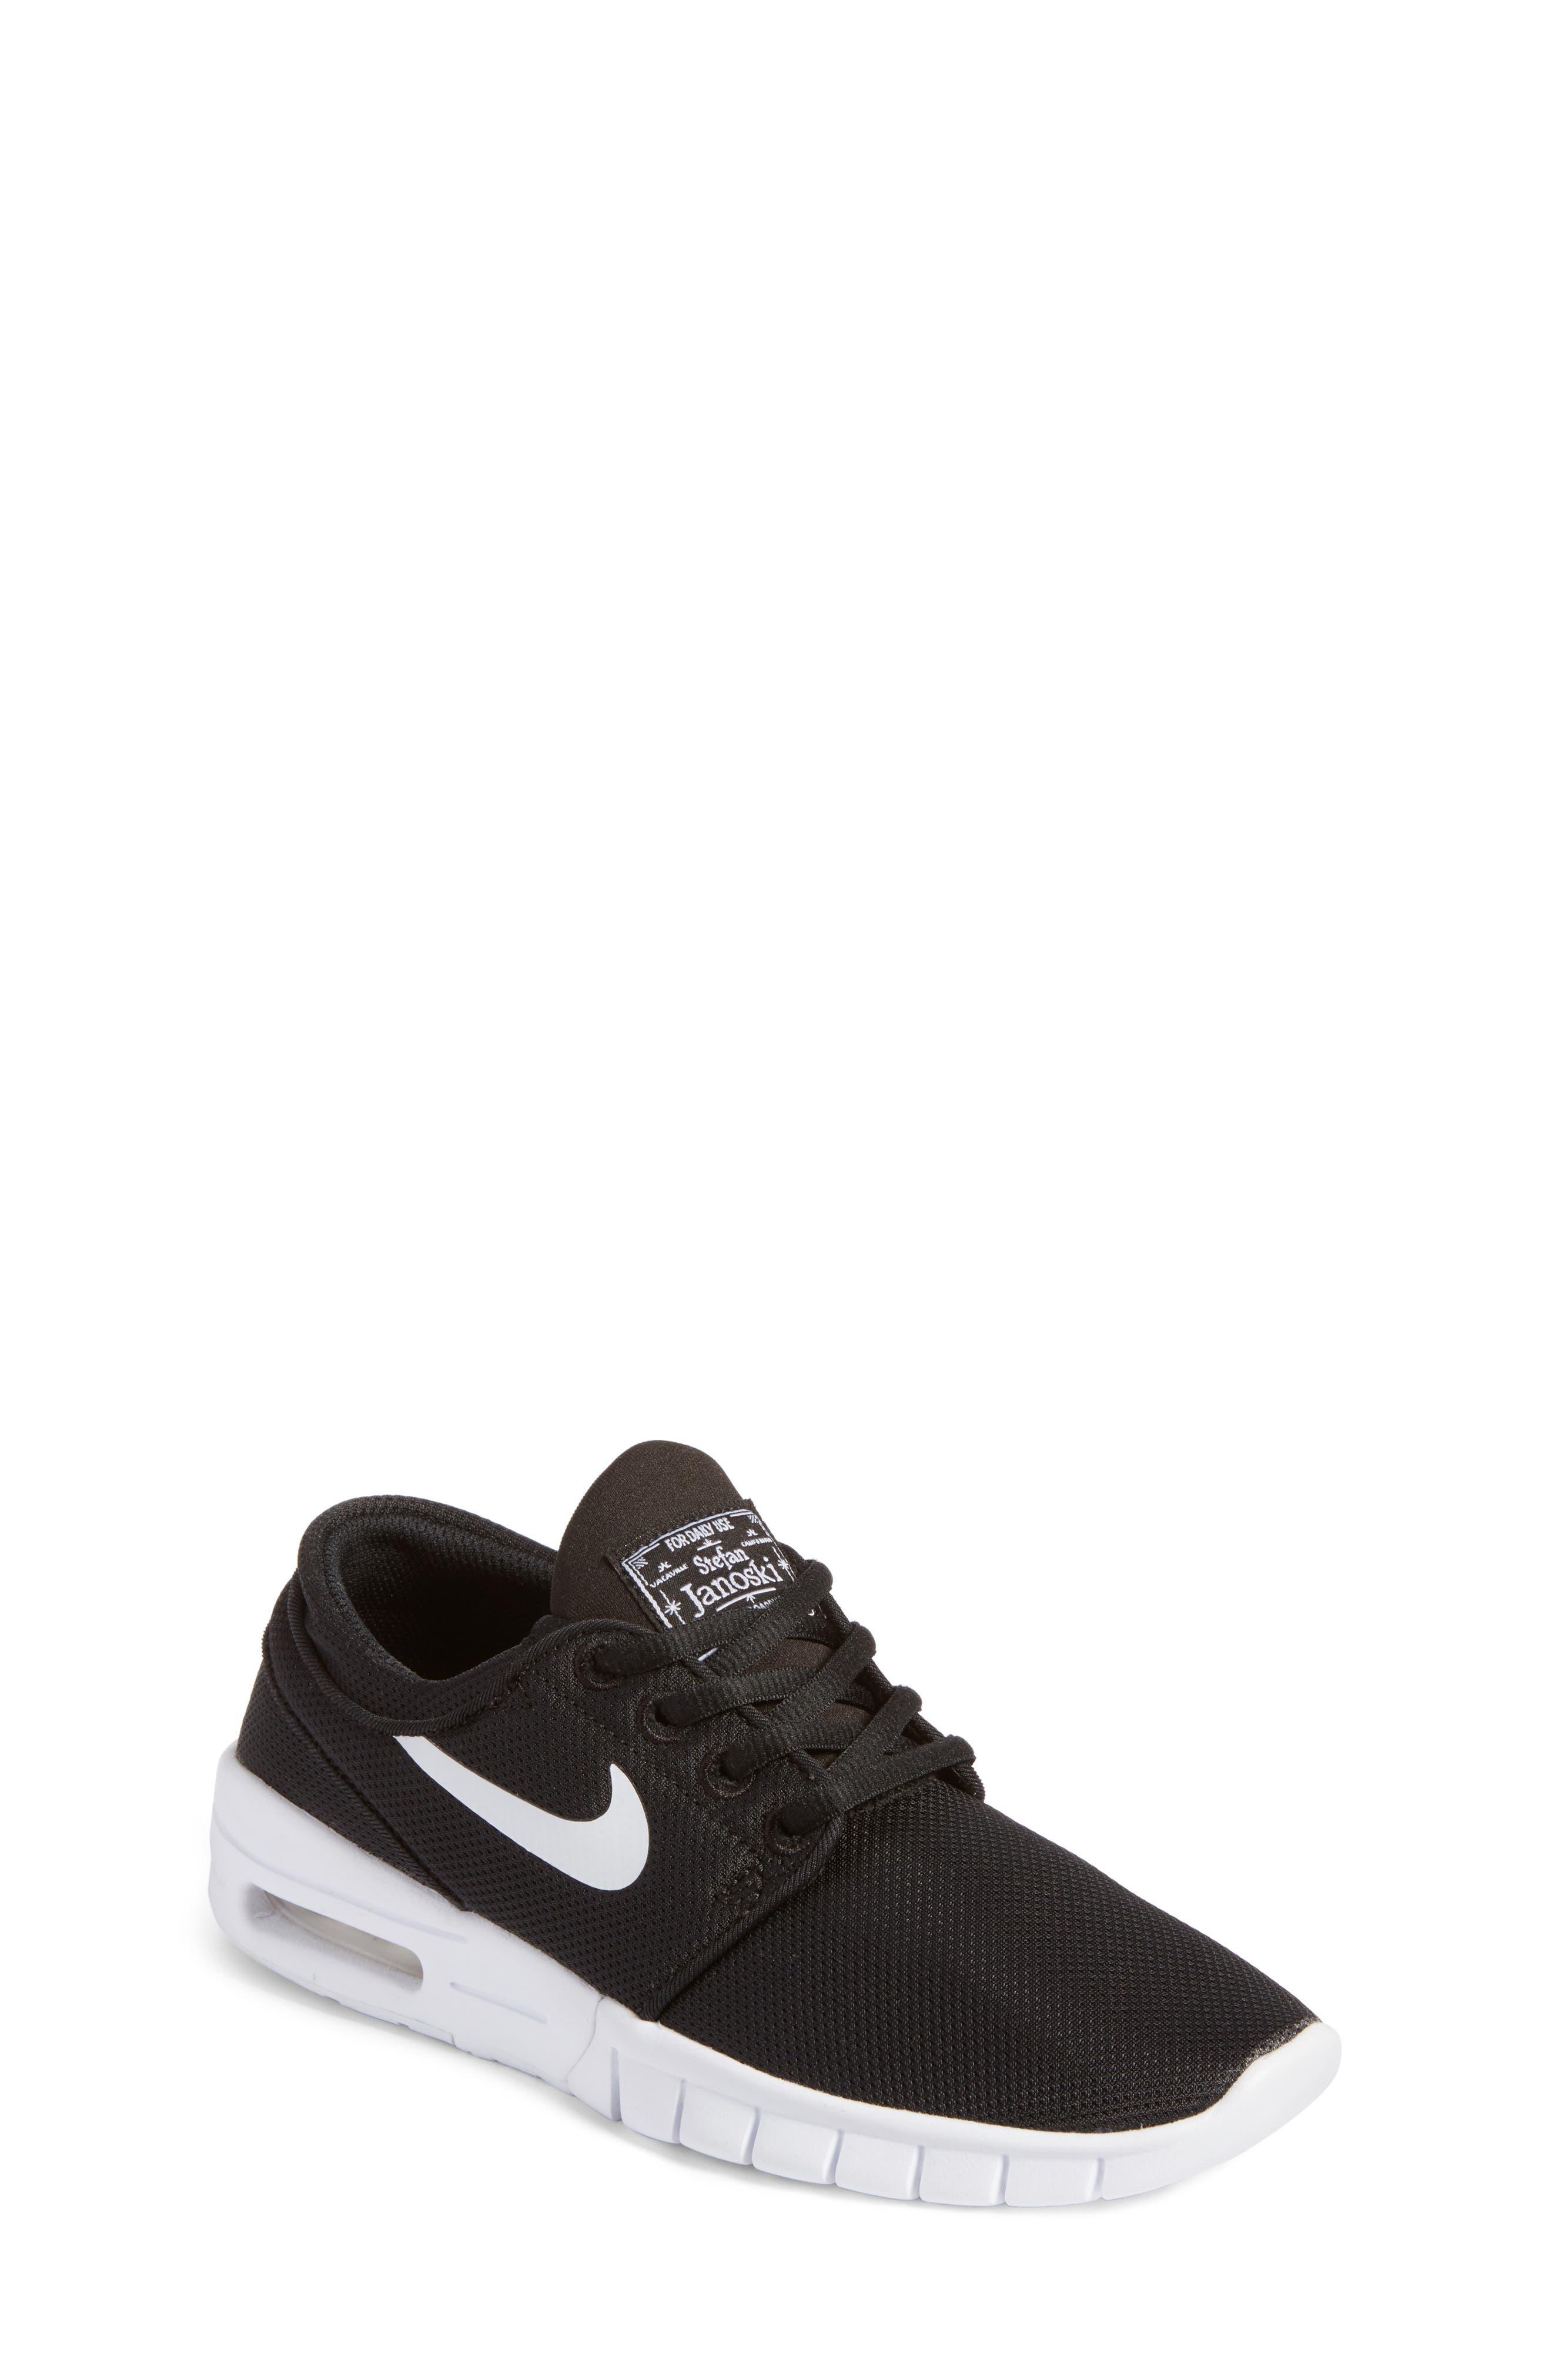 Nike Stefan Janoski Max SB Skate Sneaker (Big Kid)